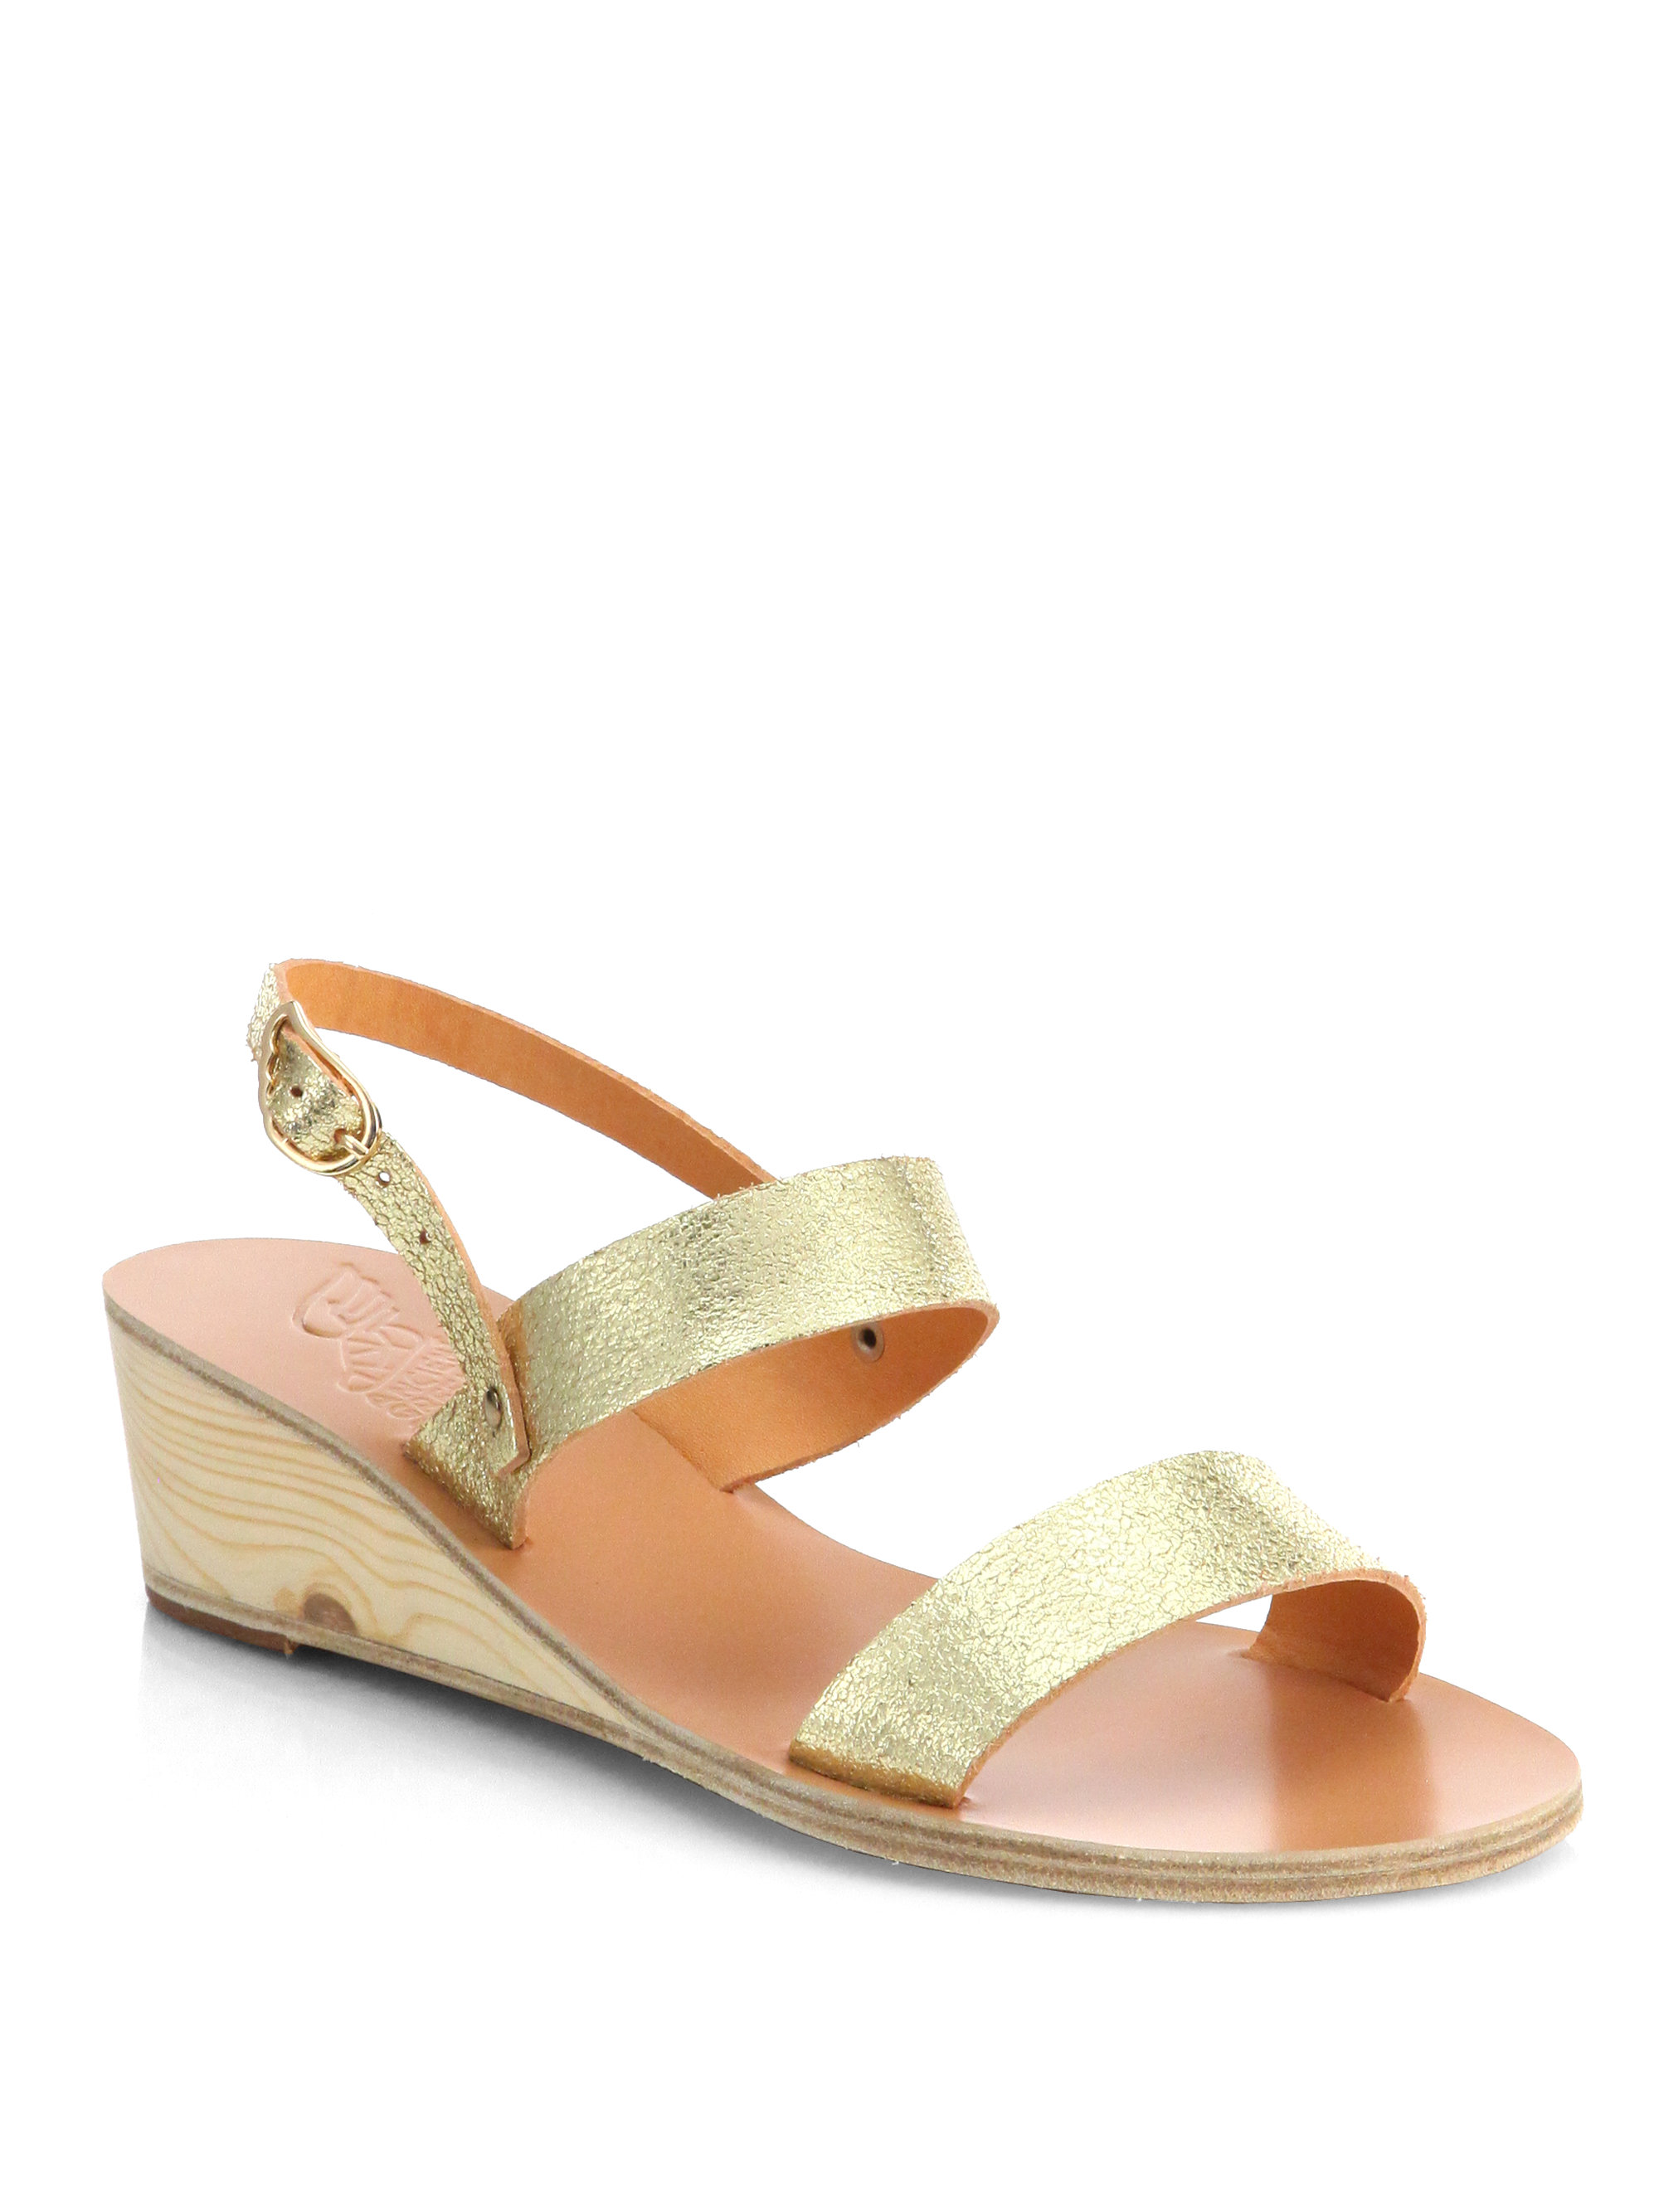 Lyst Ancient Greek Sandals Clio Metallic Leather Wedge